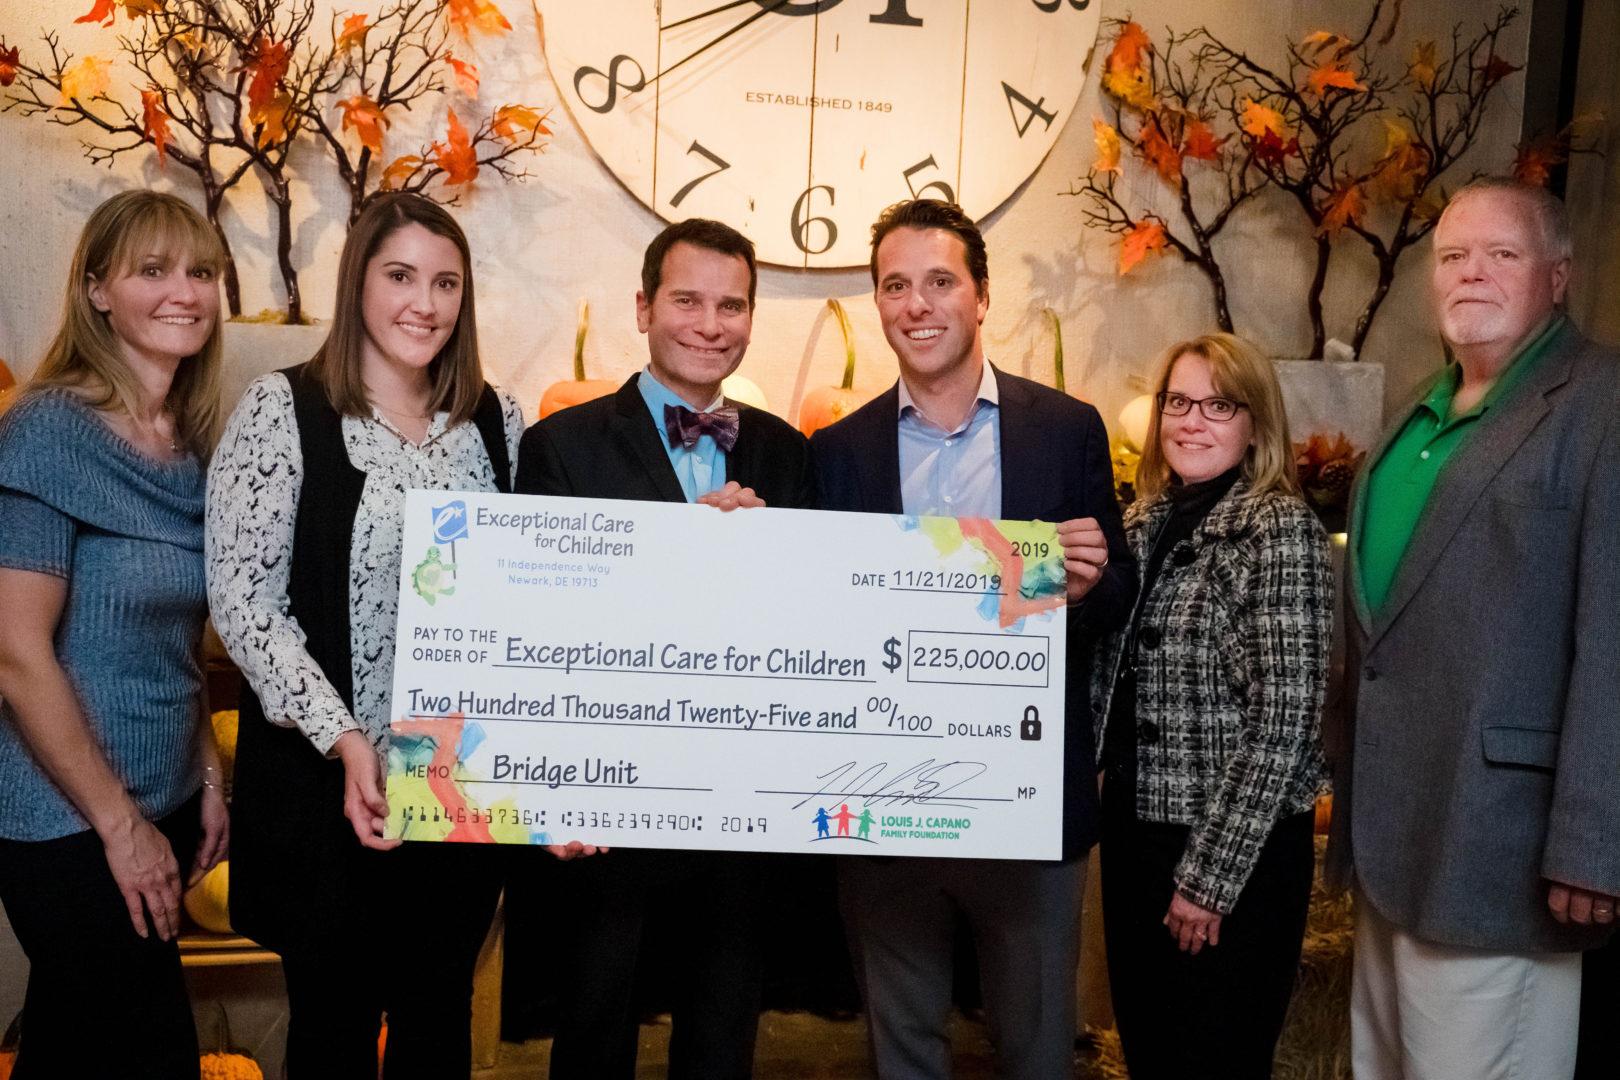 Louis Capano Family Foundation Donates $225,000 to ECC